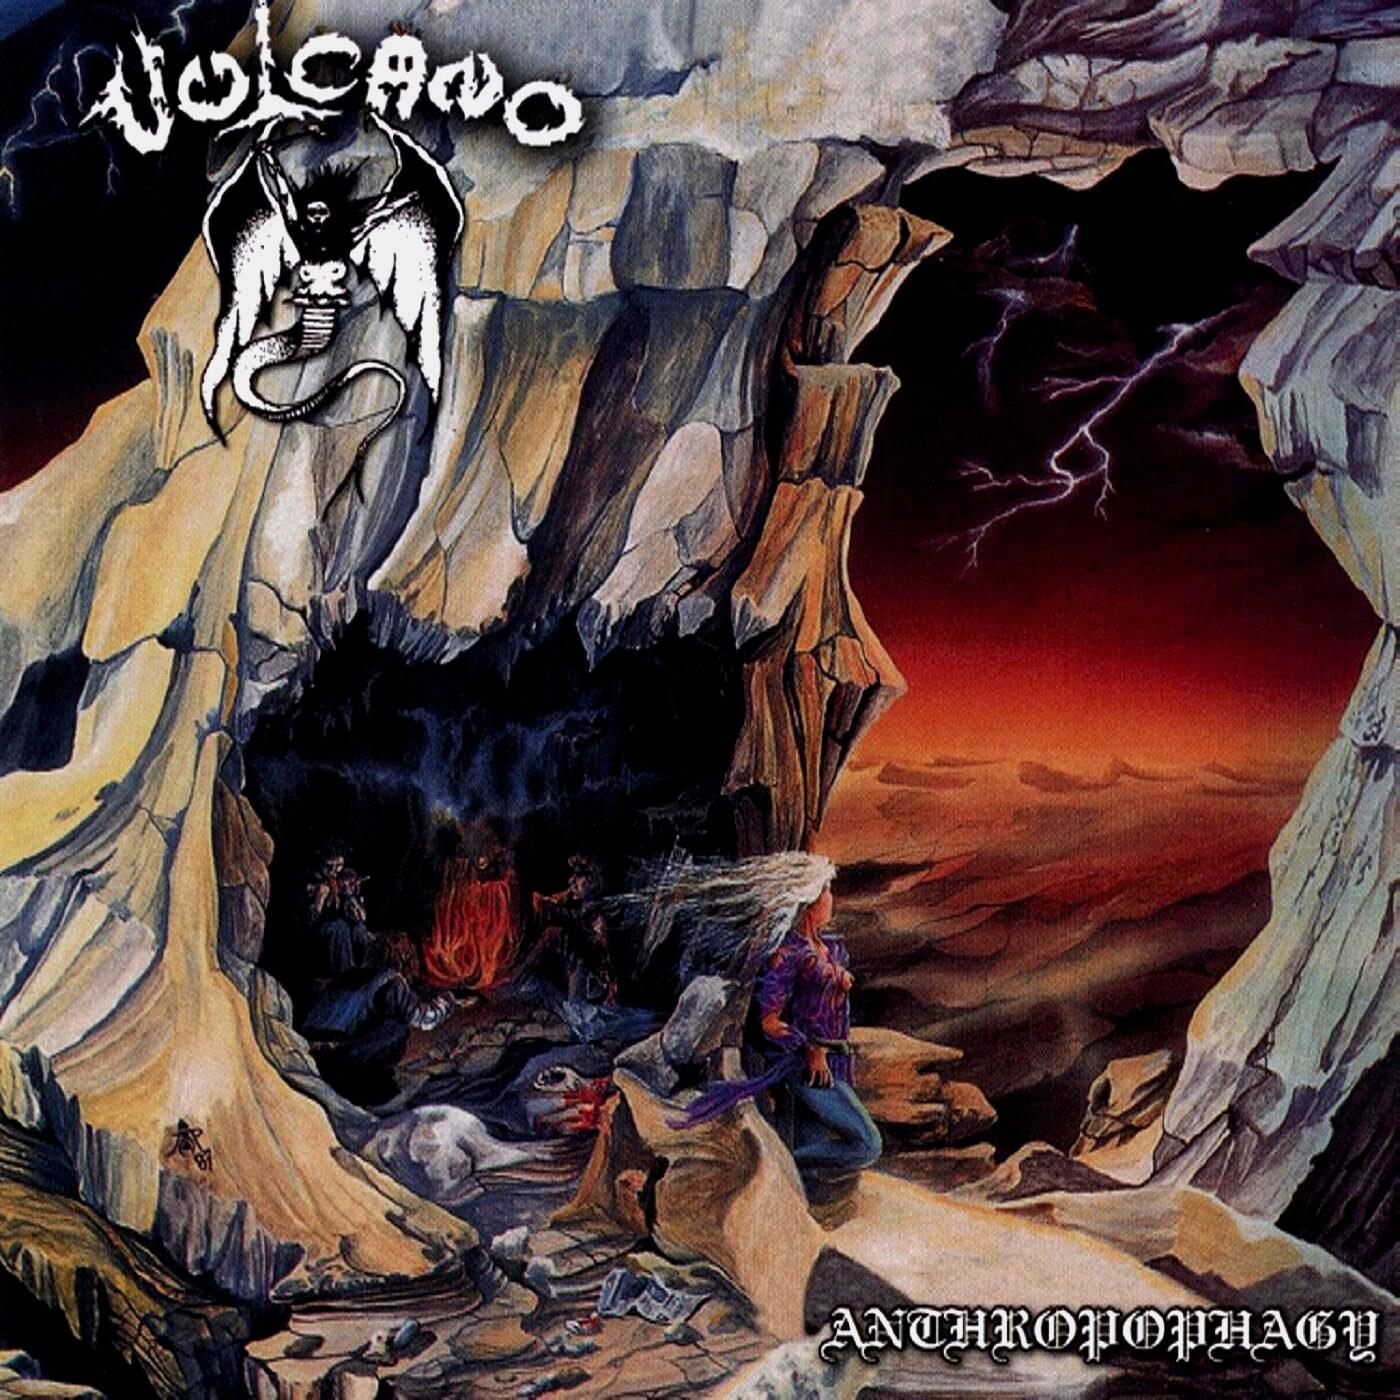 Reviews for Vulcano - Anthropophagy